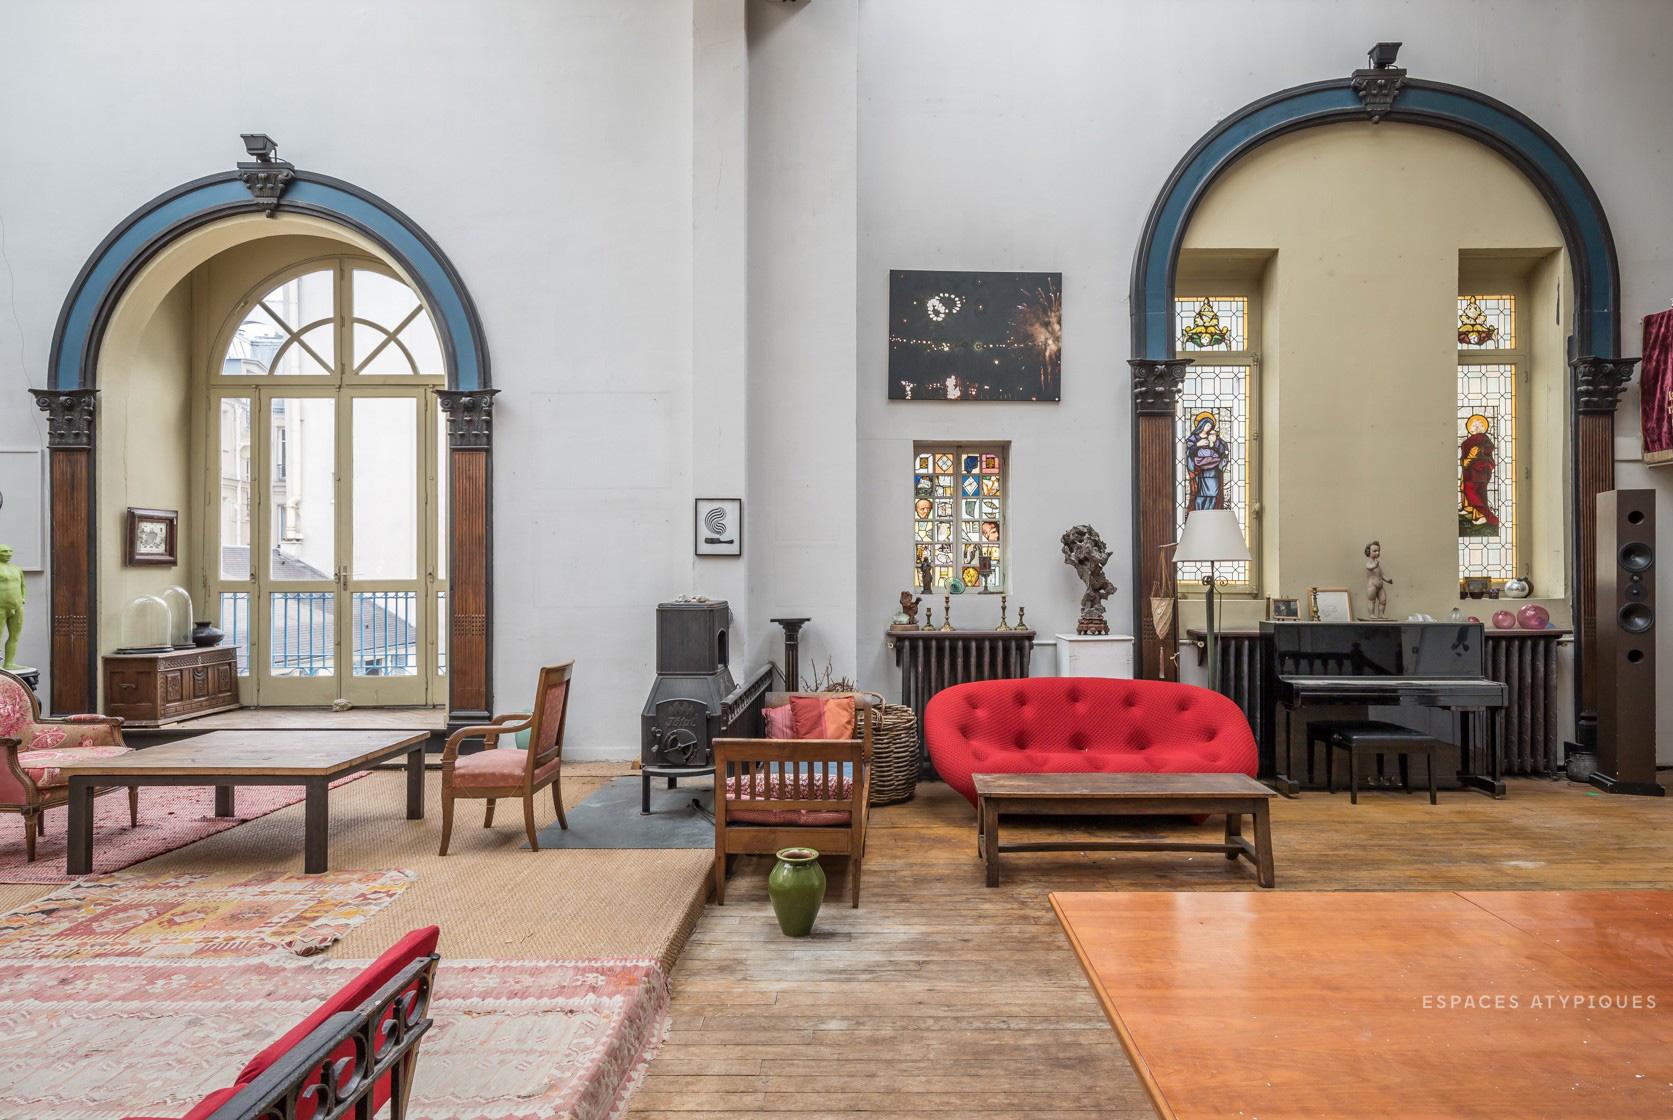 Antique-filled atelier for sale in Paris